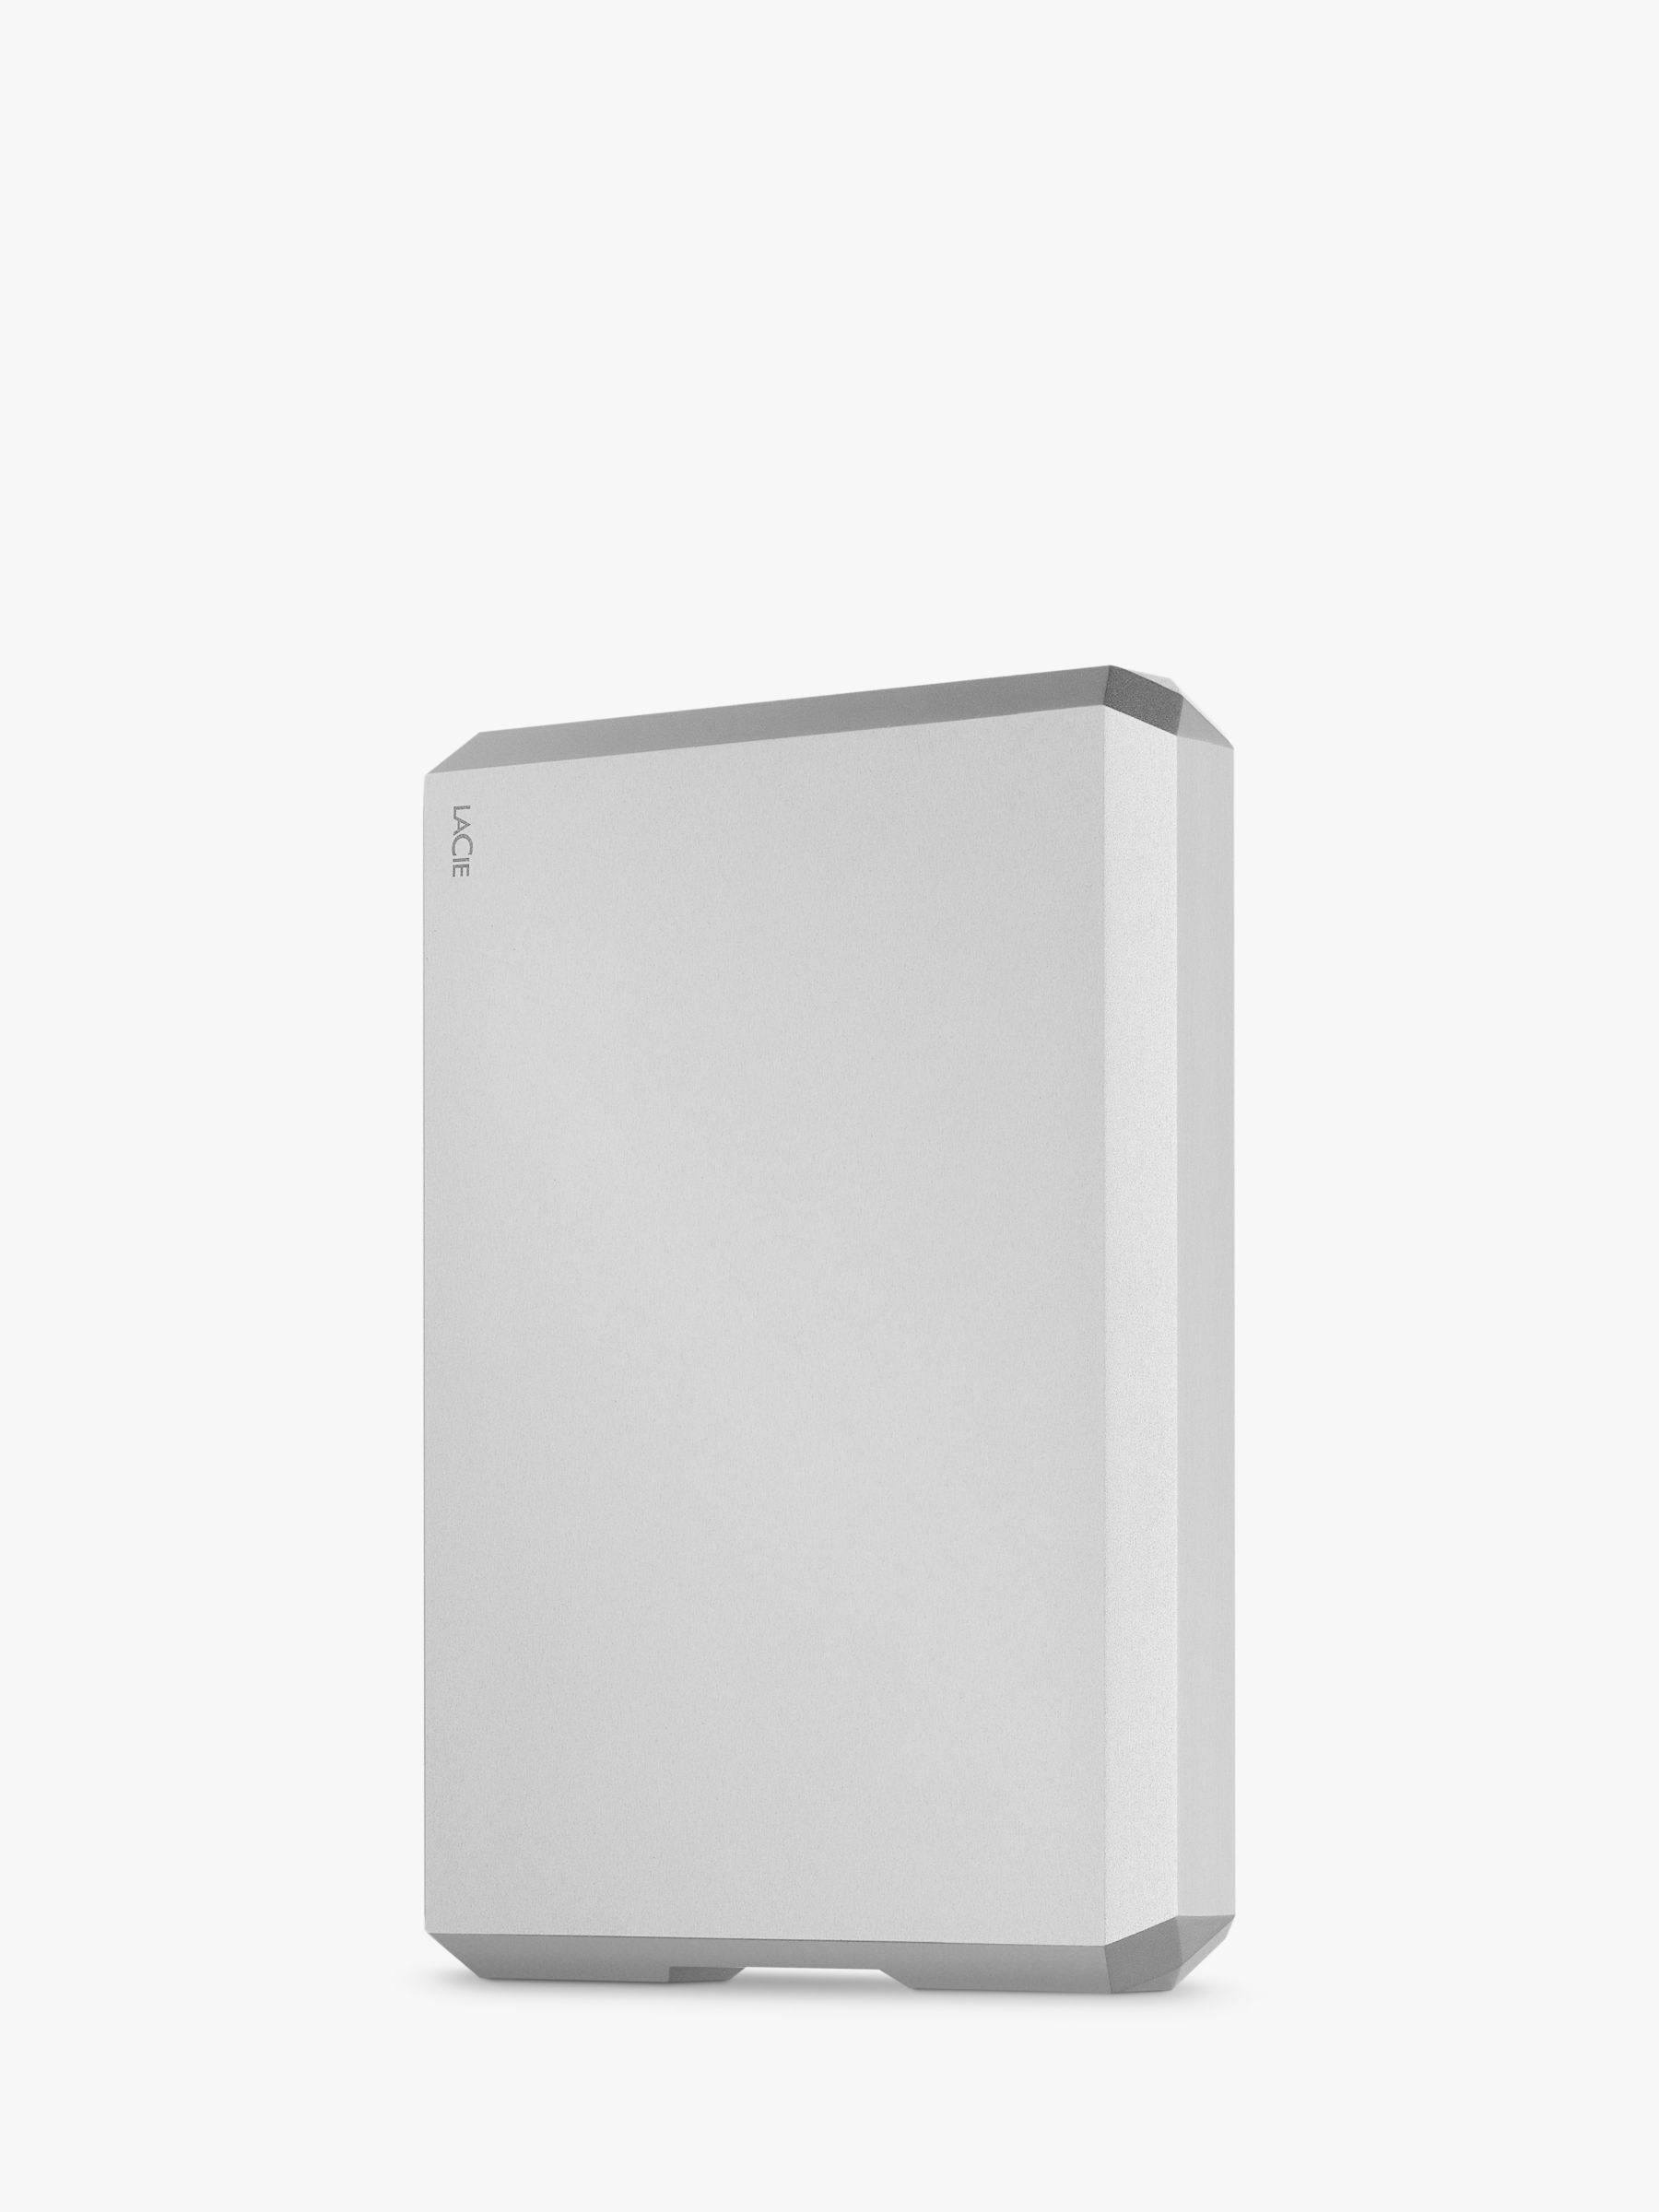 Lacie LaCie STHG4000400 External Hard Disk Drive, 4TB, USB Type-C, Silver